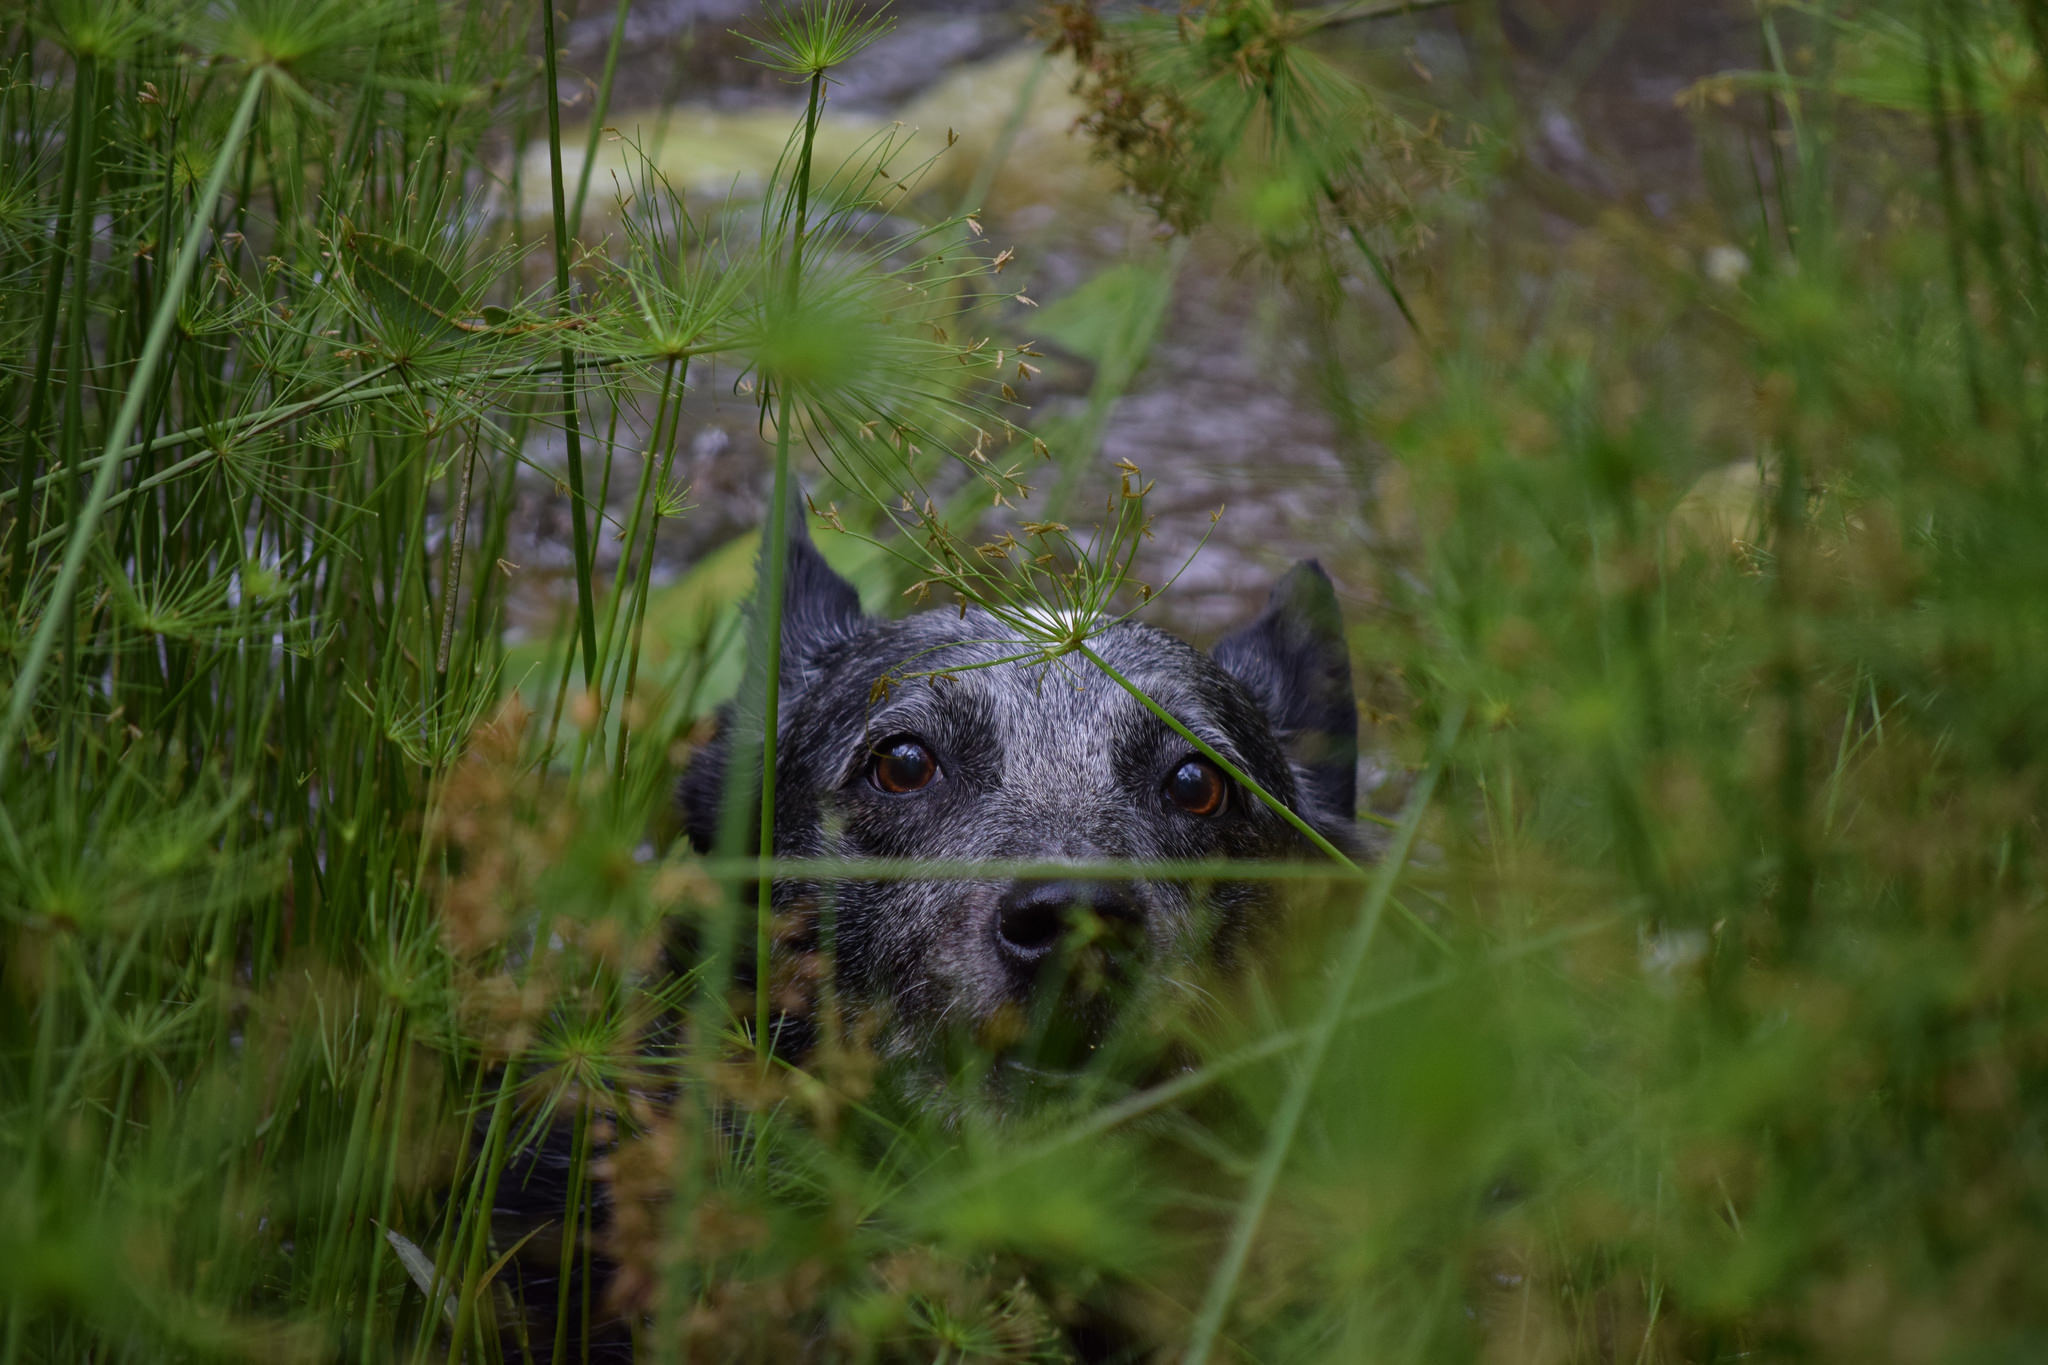 Australian Cattle Dog Dog Pet Plant Stare 2048x1365